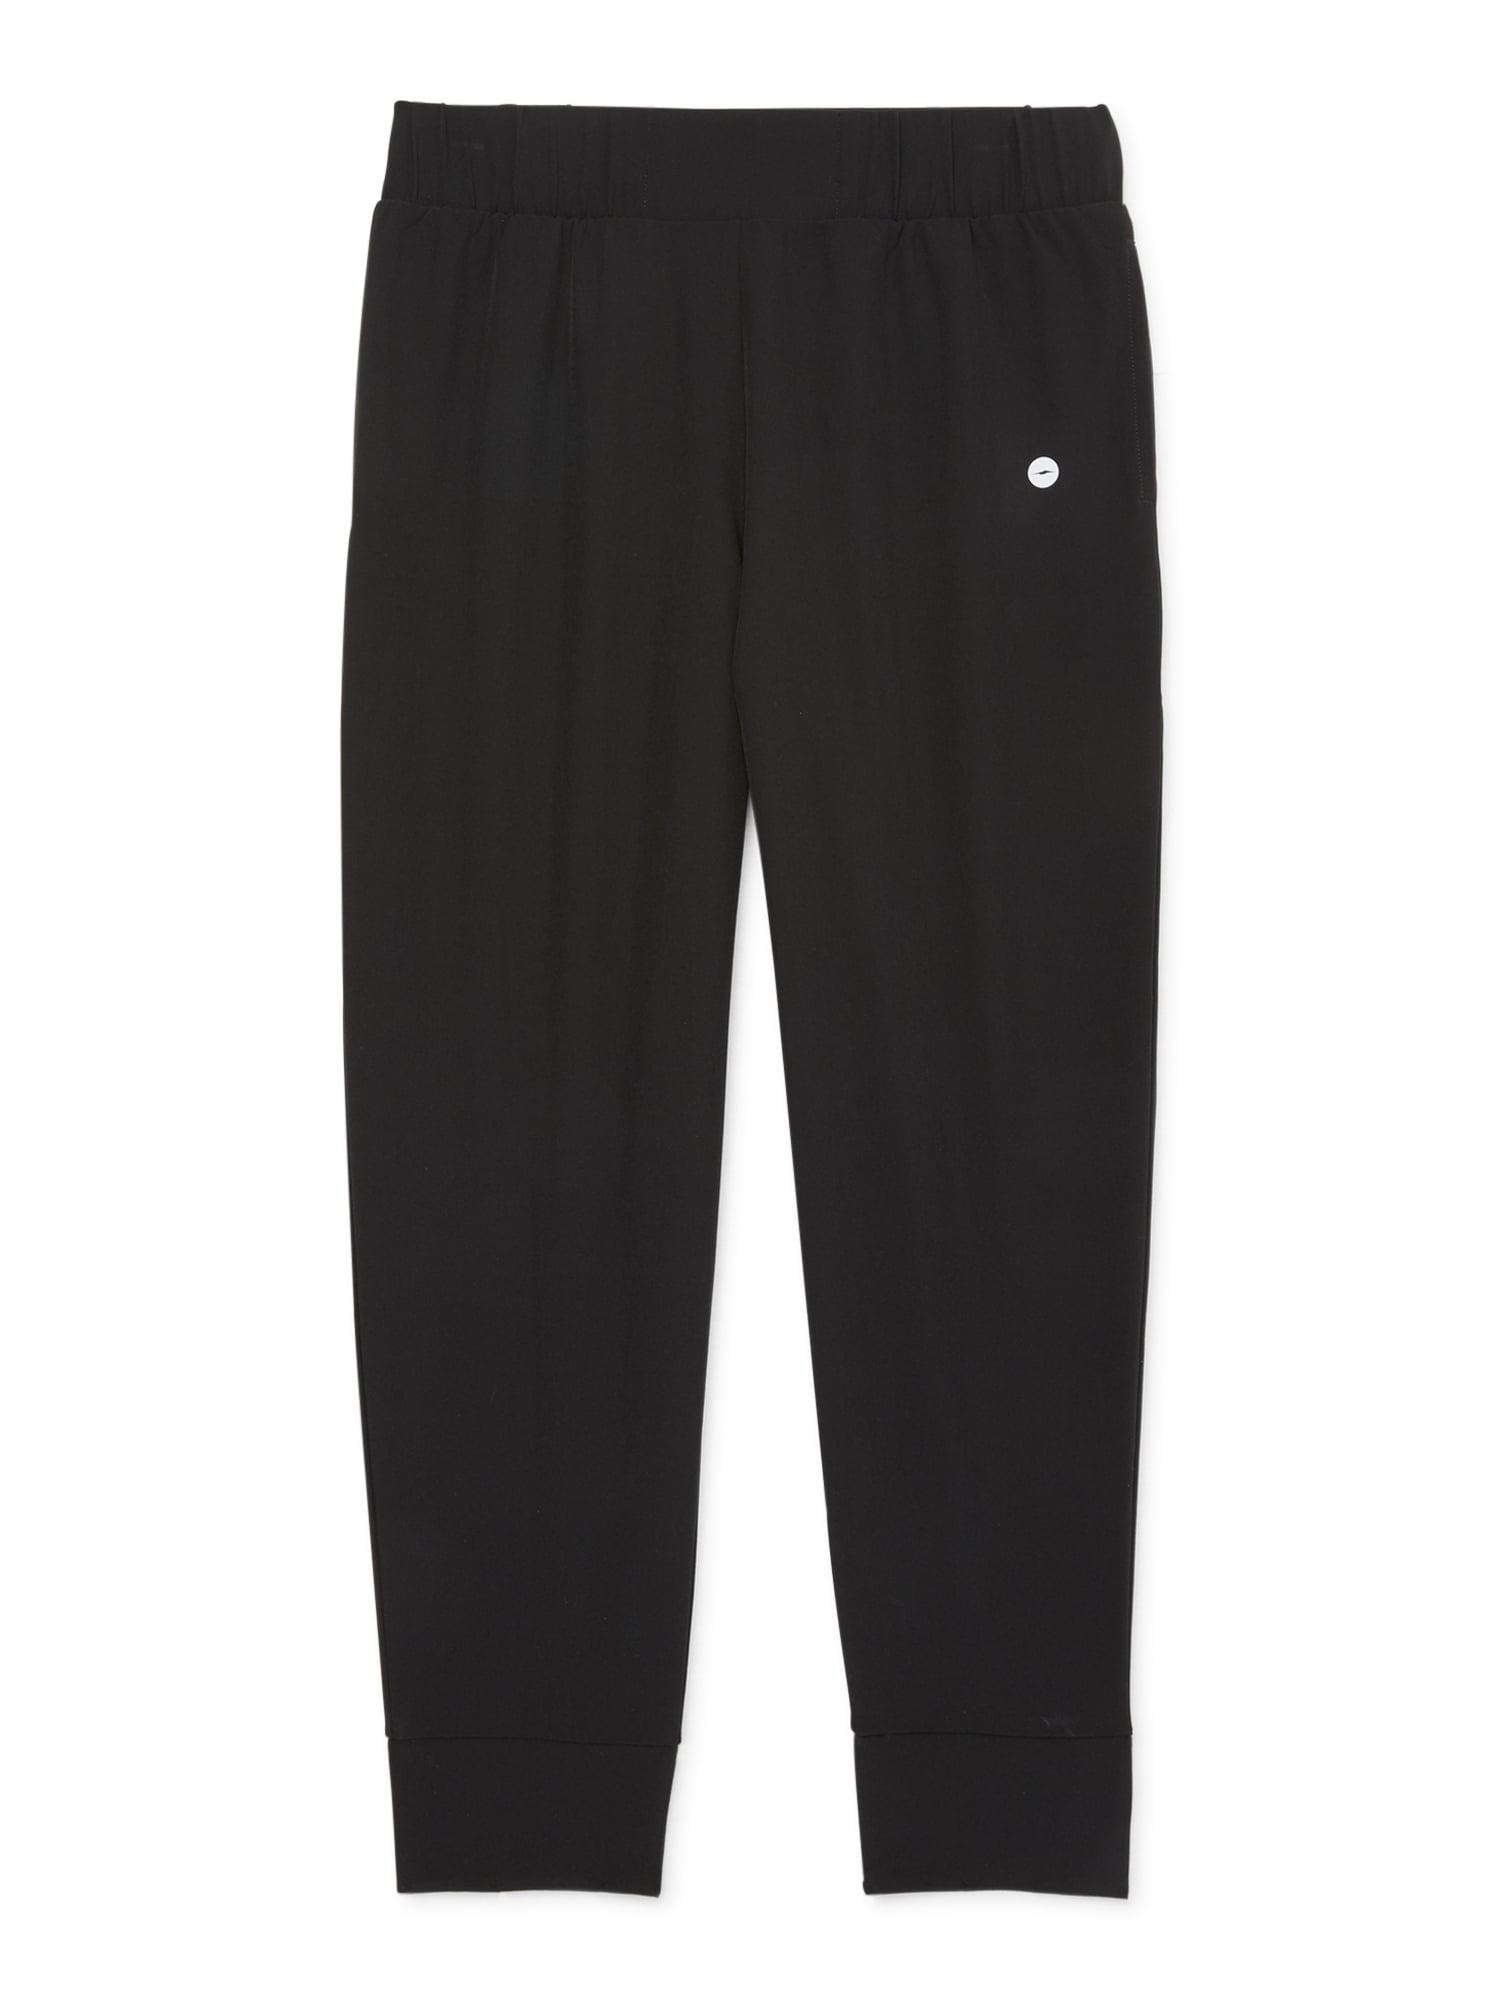 Avia - Avia Girls Active Woven Jogger Sweatpants, Sizes 4-18 - Walmart.com  - Walmart.com